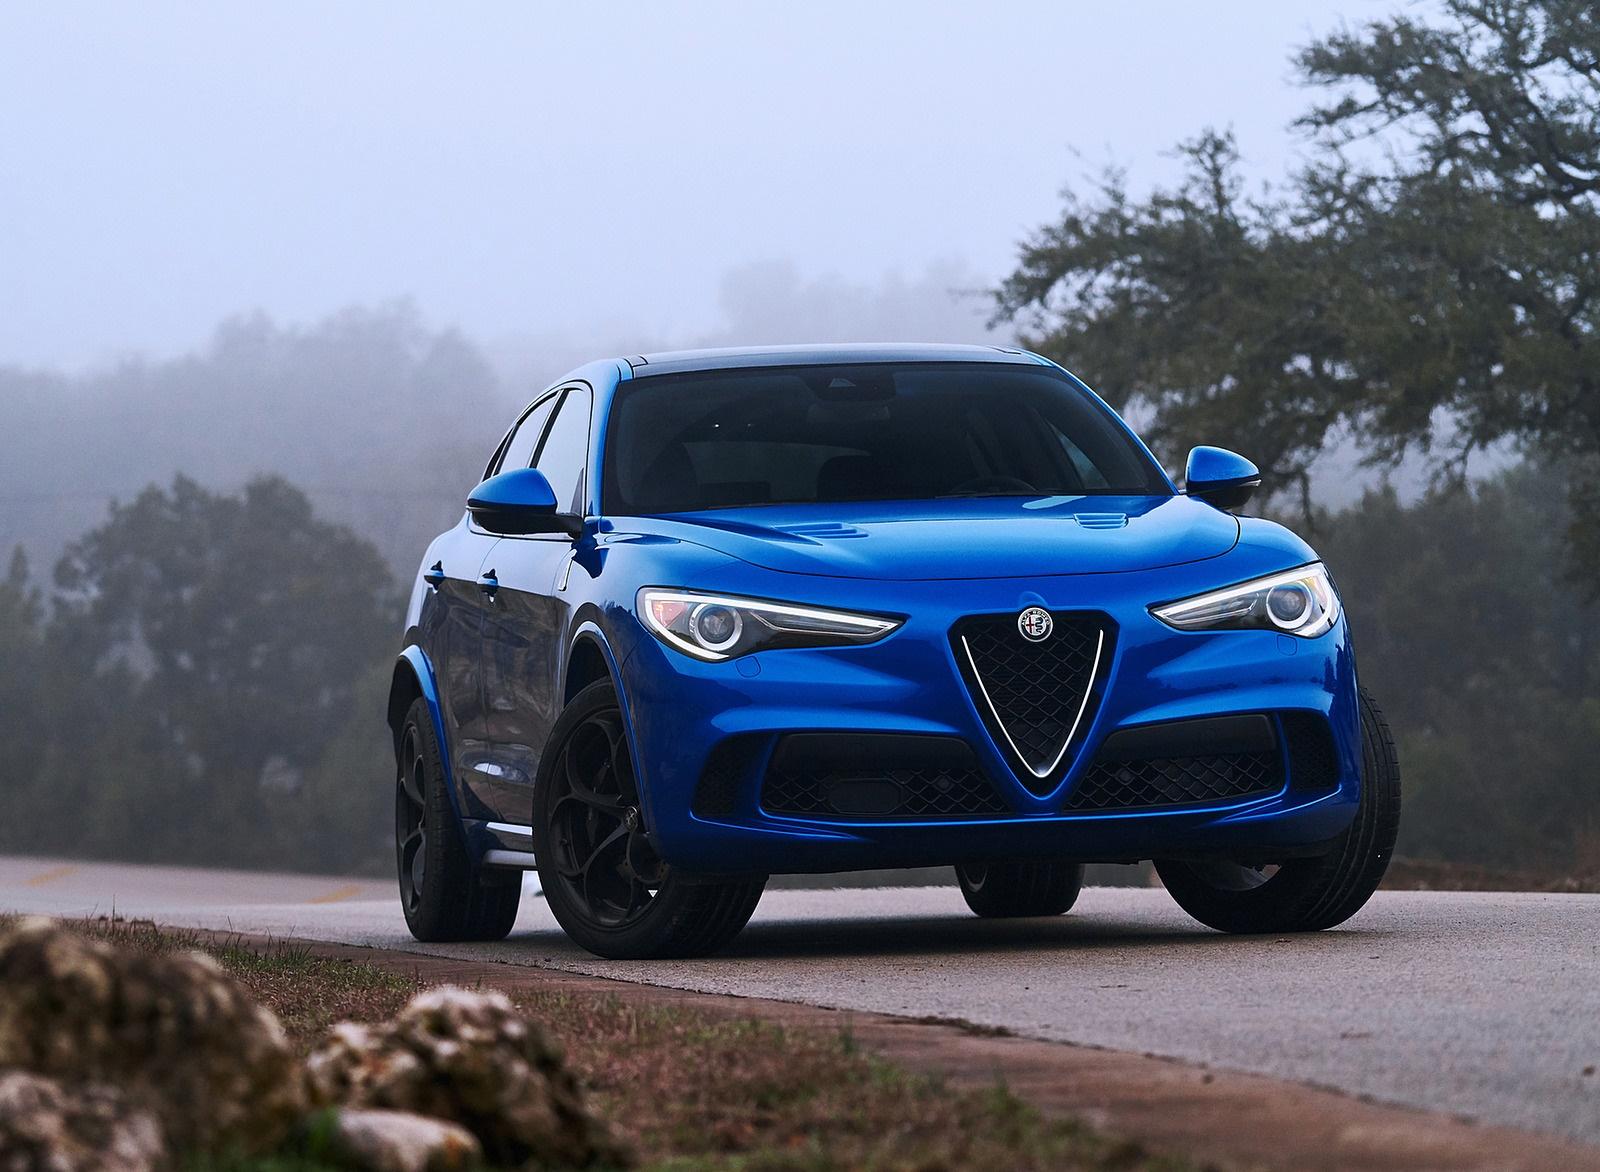 2018 Alfa Romeo Stelvio Quadrifoglio (Color: Misano Blue) Front Wallpapers #33 of 87